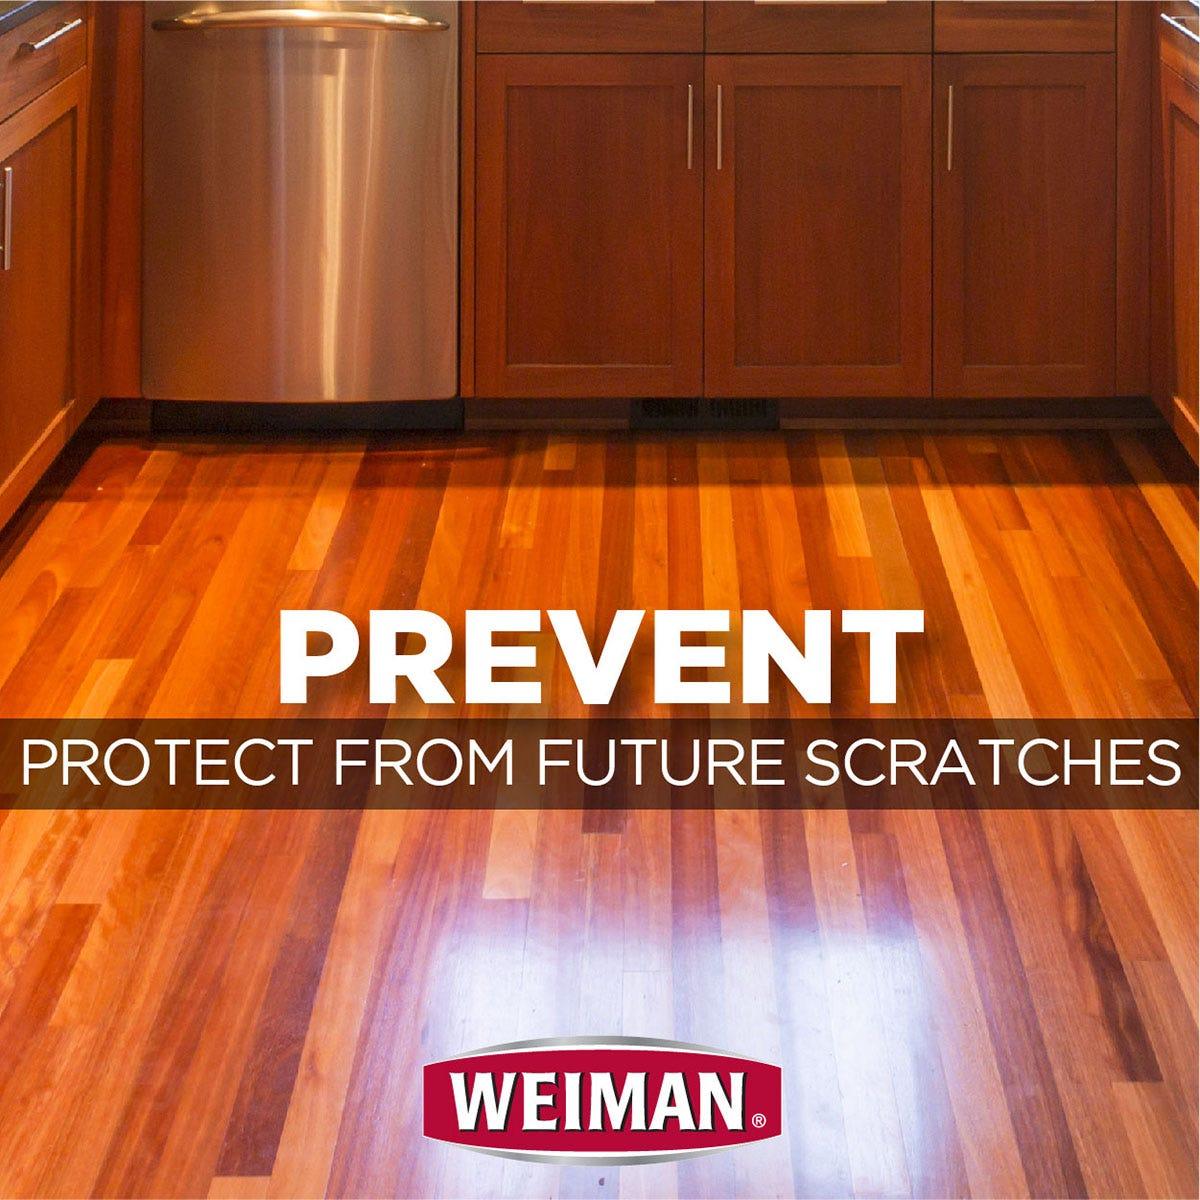 Prevent future scratches